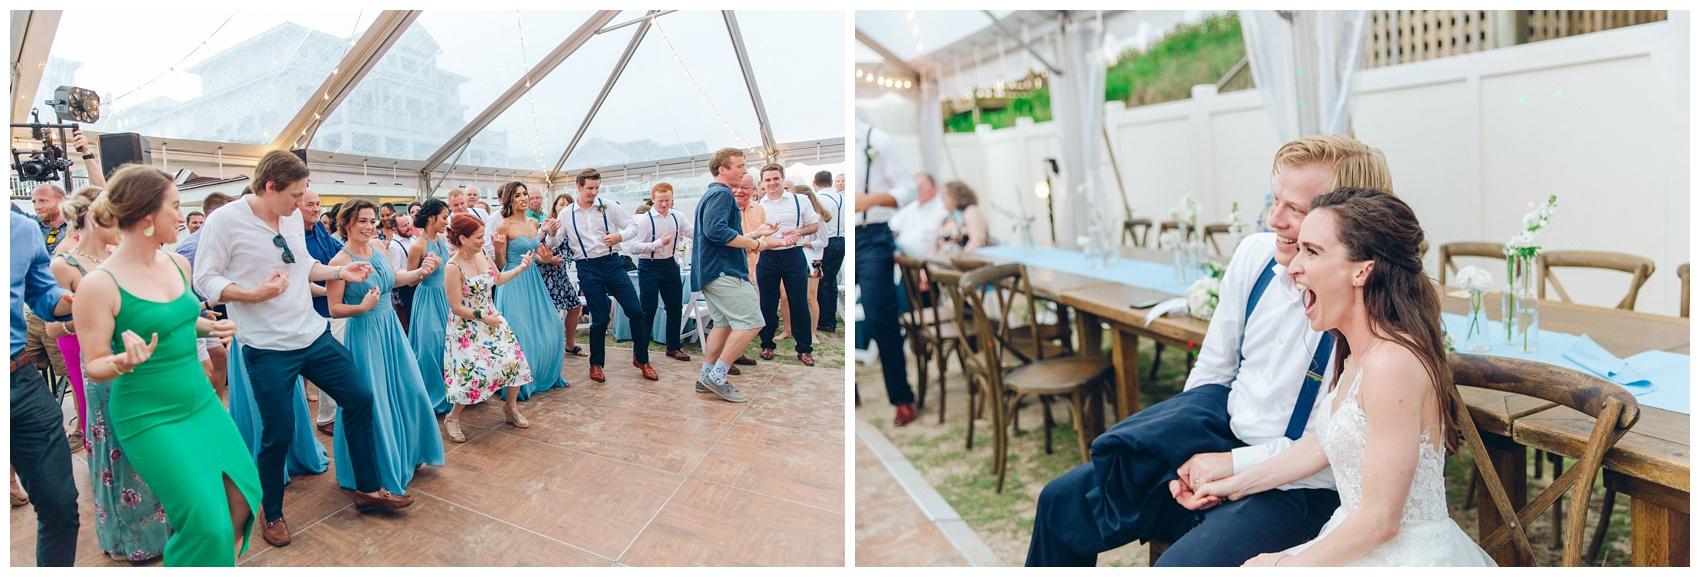 Outer-Banks-Corolla-Wedding_0113.jpg